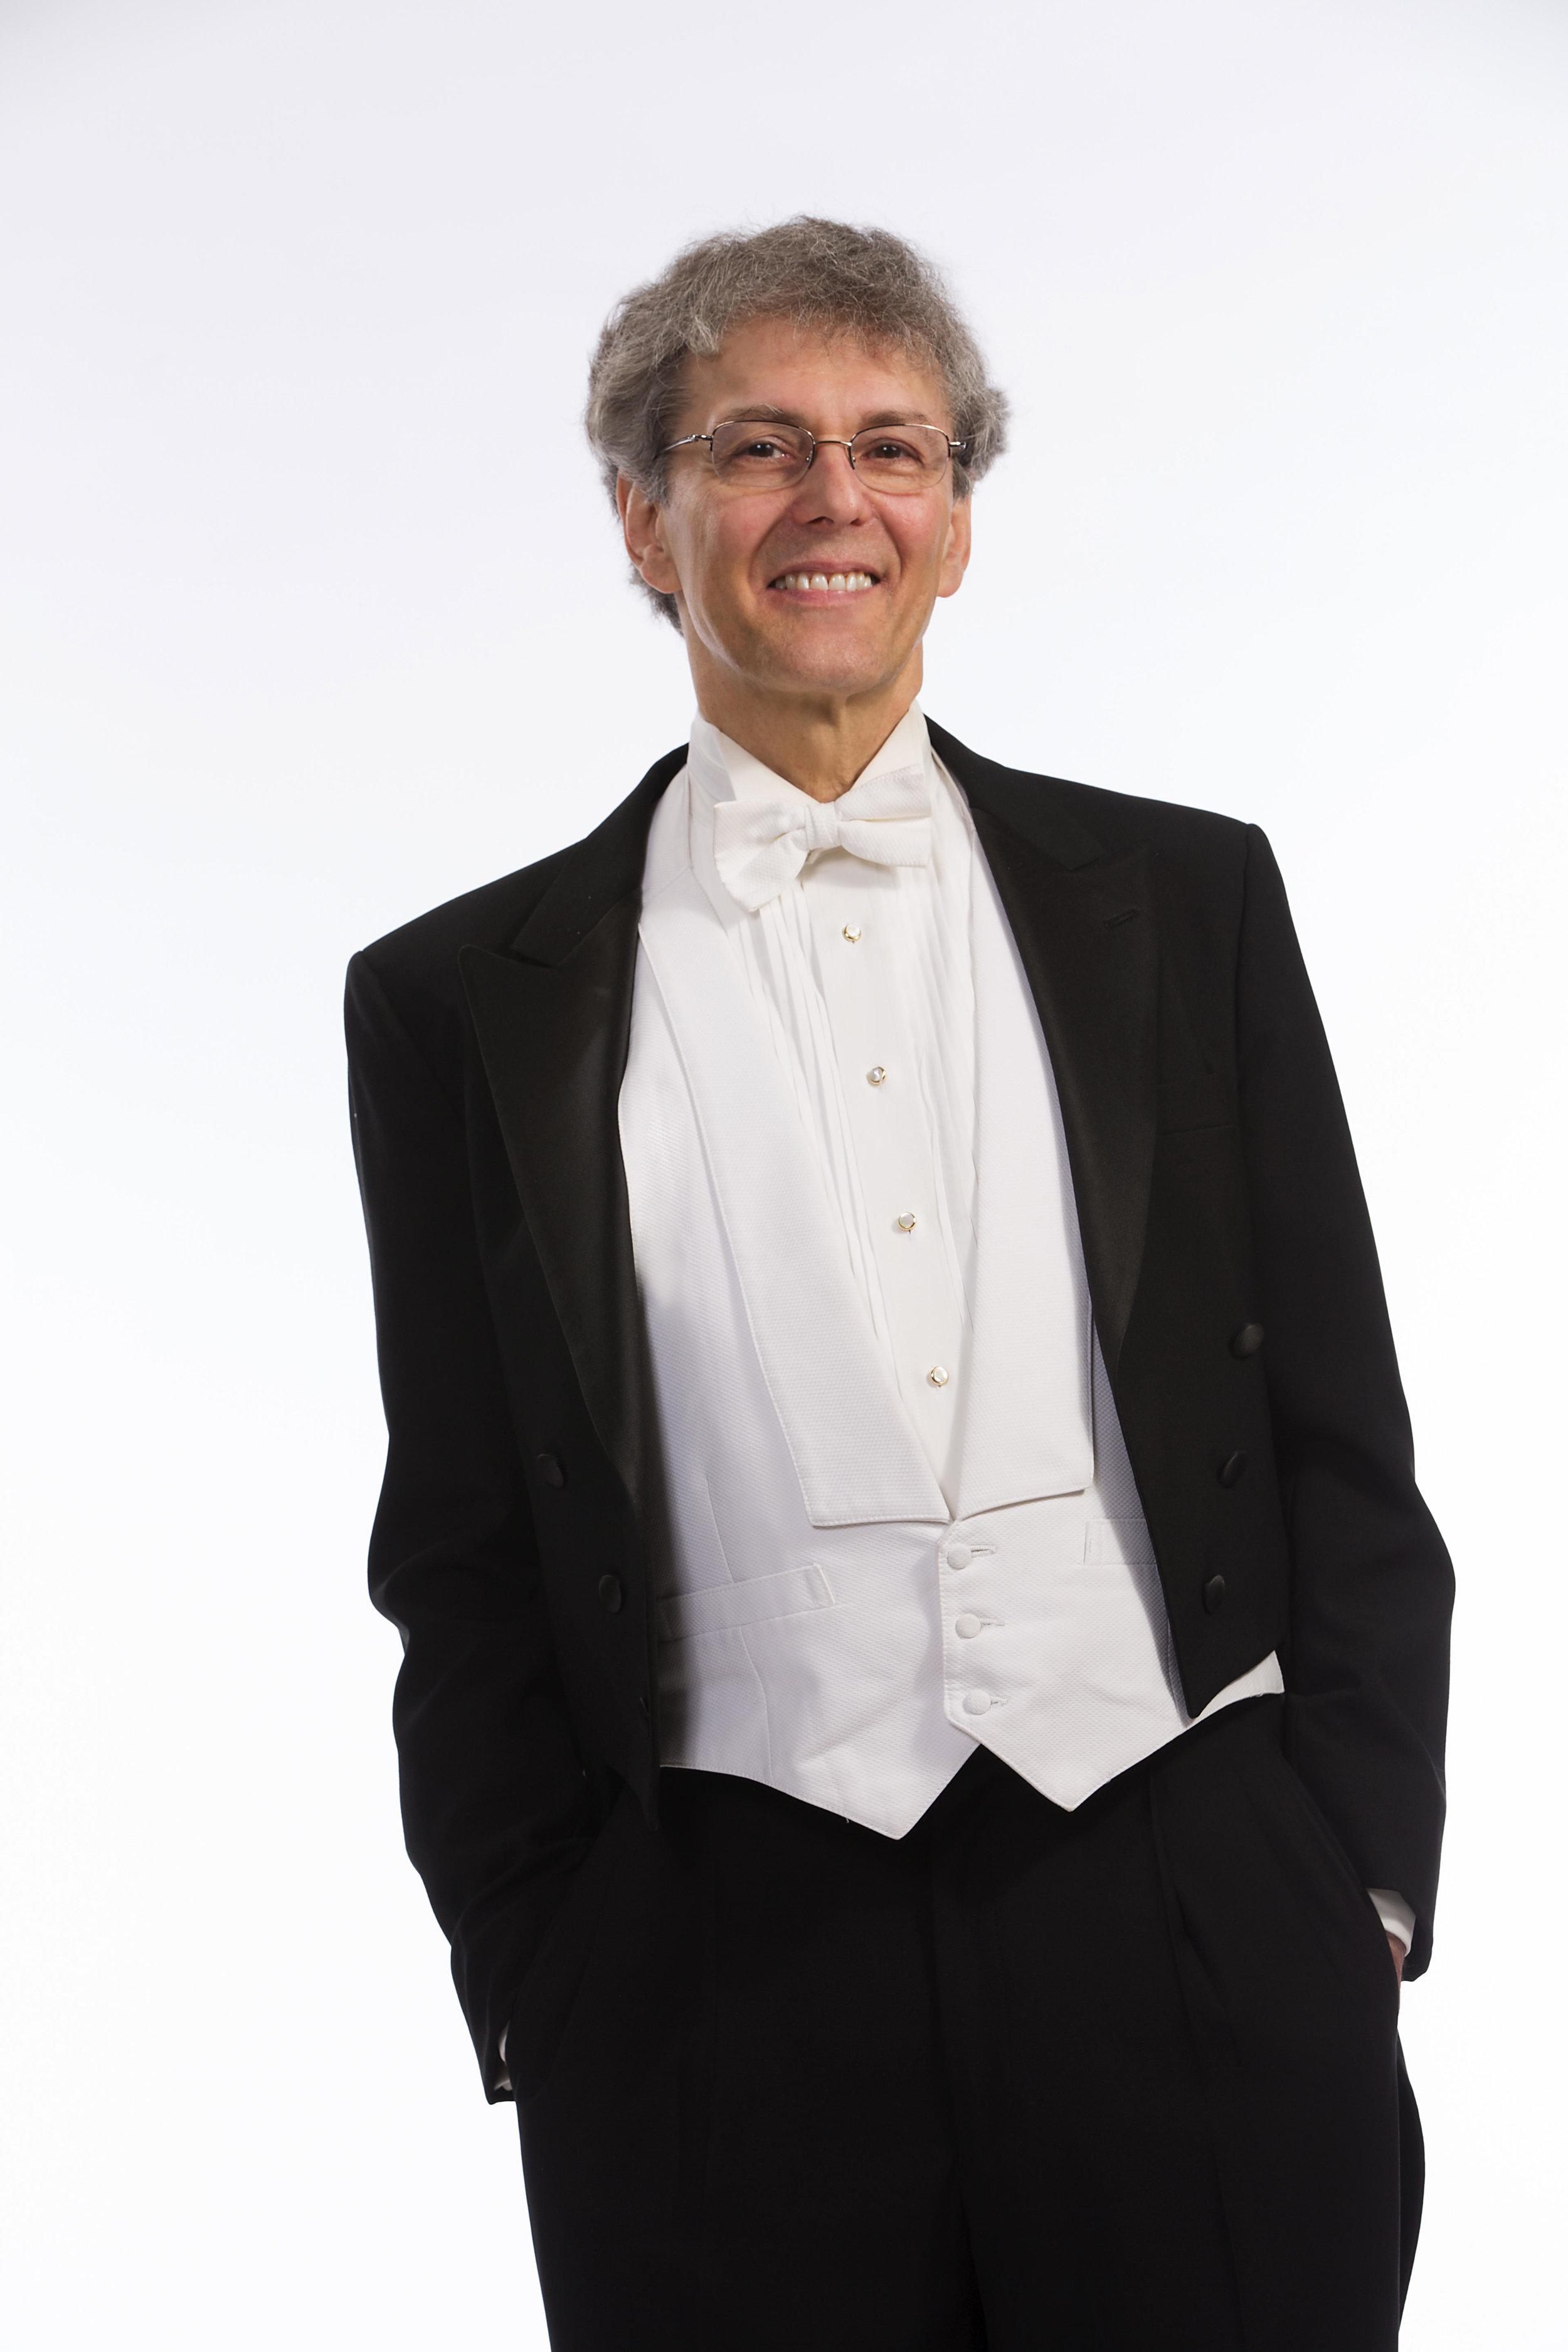 Martin Pearlman